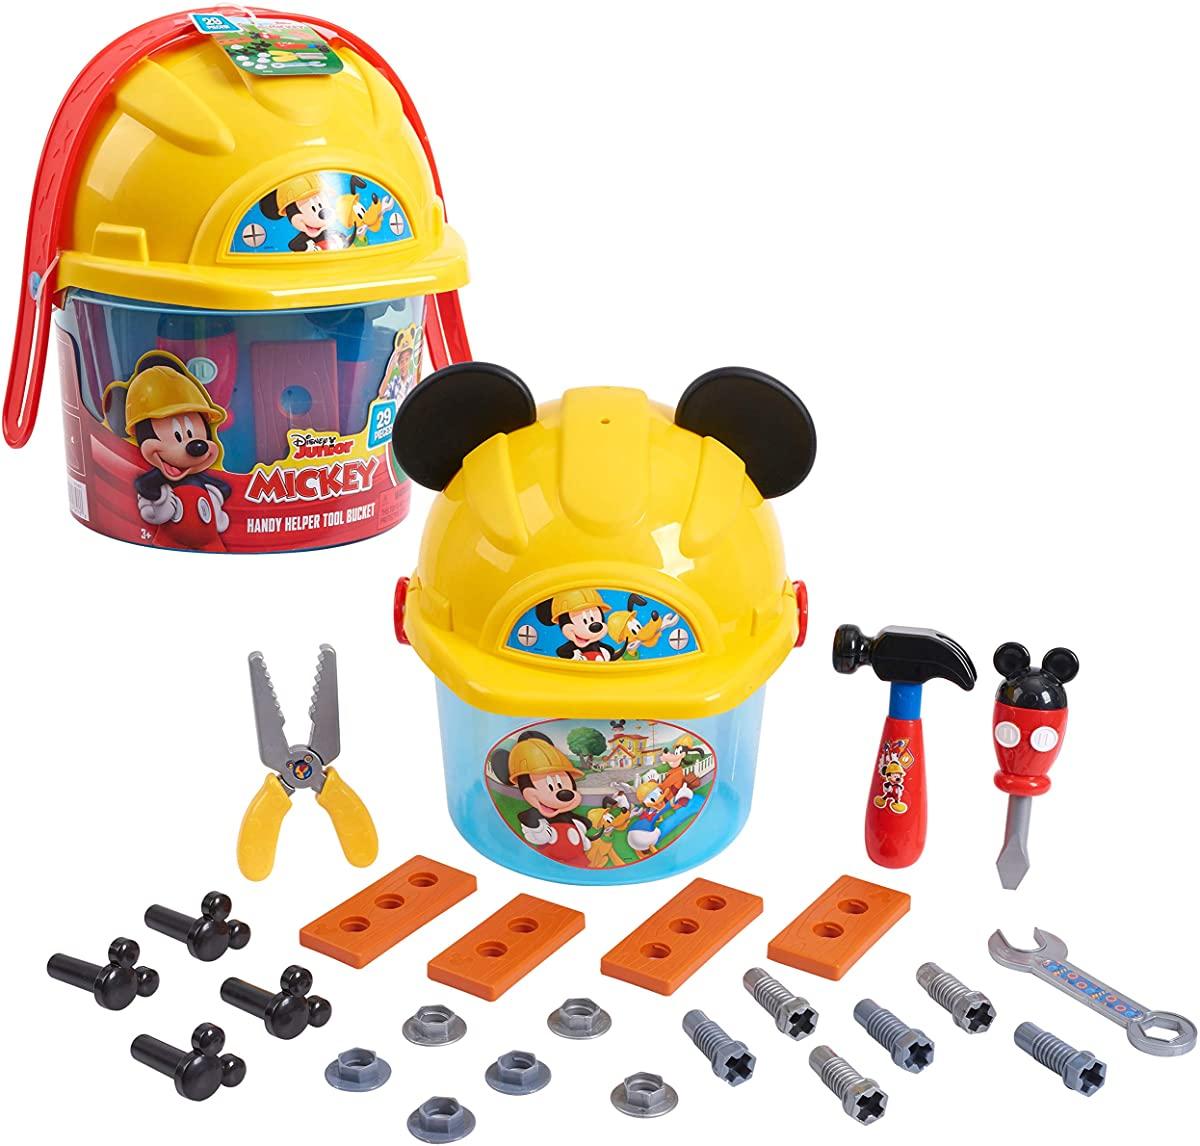 Disney Mickey Mouse Tools